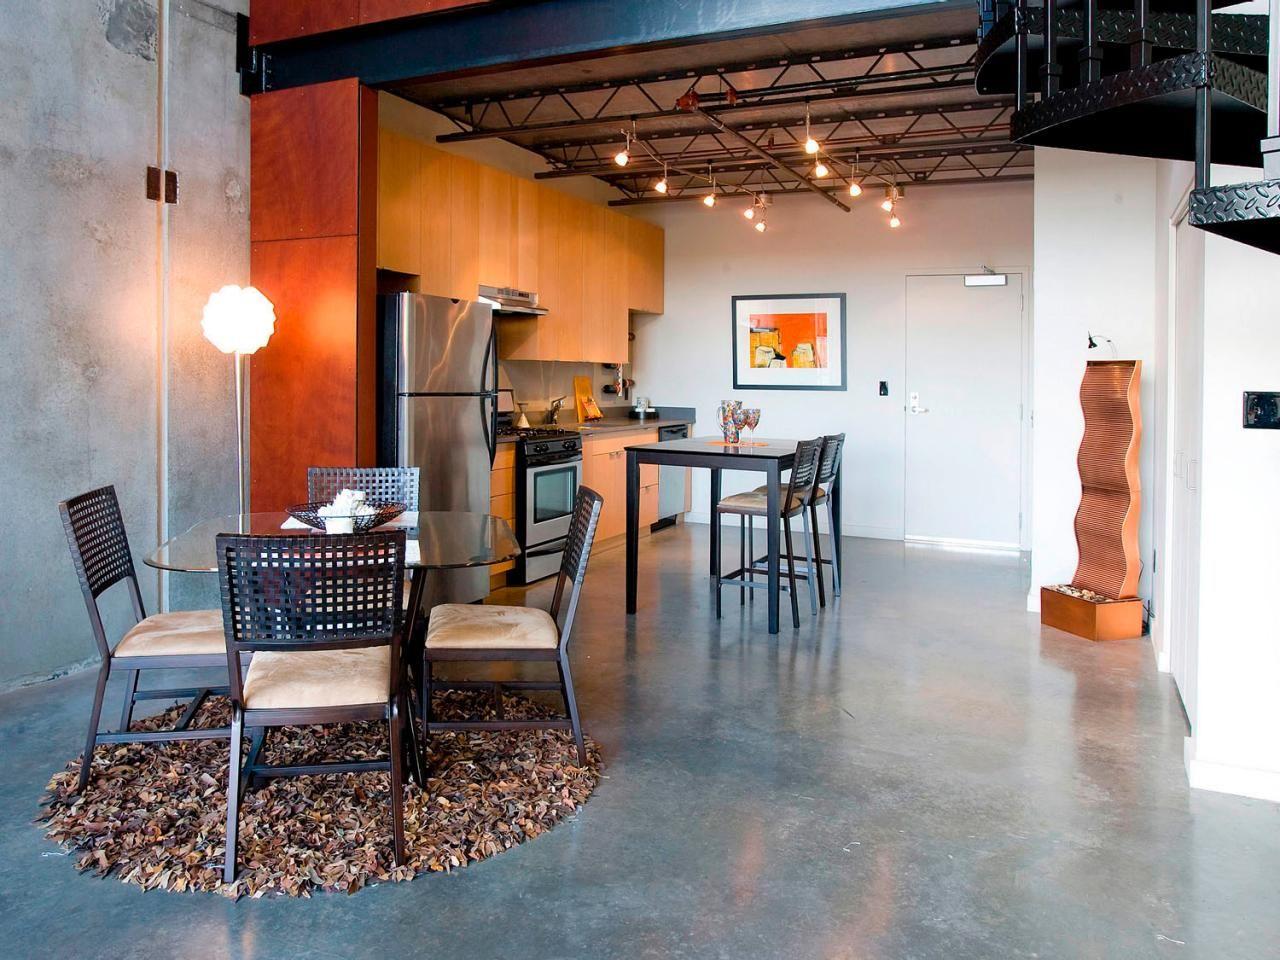 Kitchen Designers Portland Oregon Amazing Onewall Kitchens  Hgtv Kitchen Design And Kitchens Decorating Design